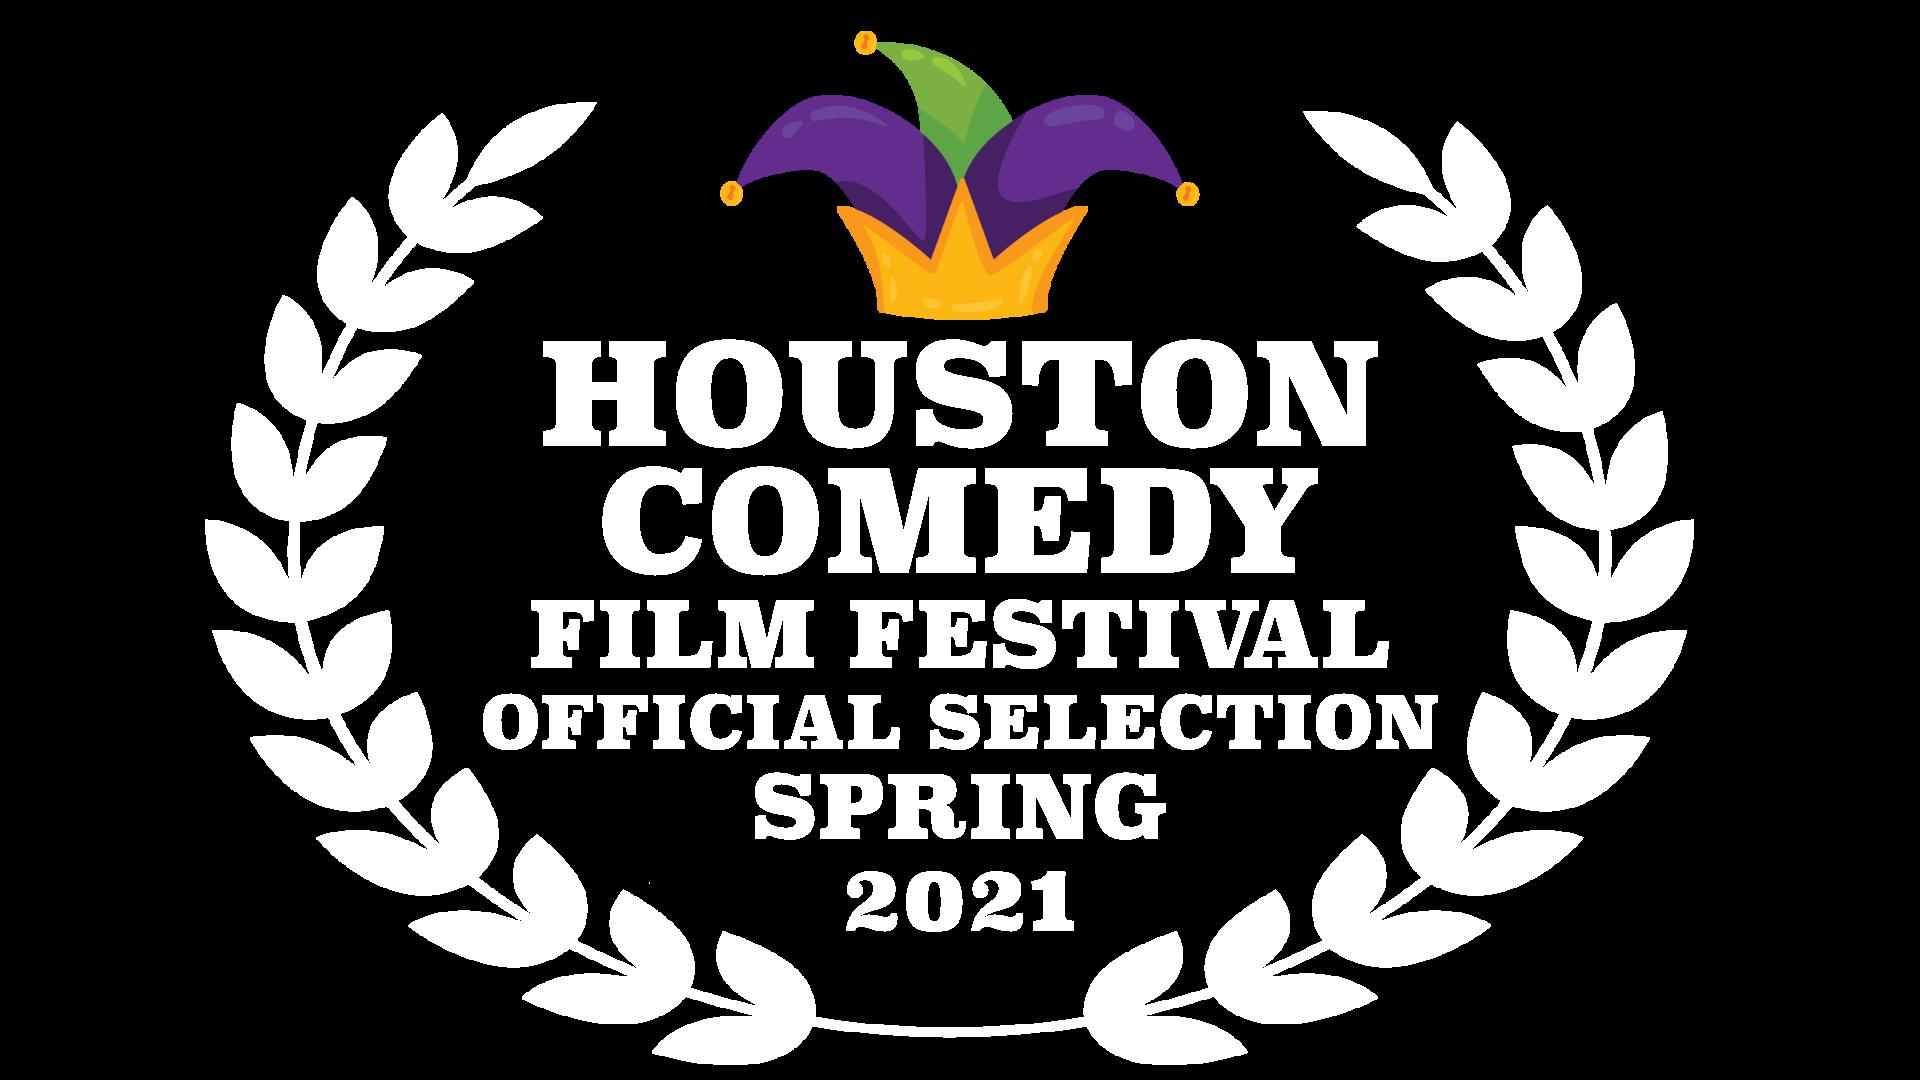 Houston Comedy Film Festival